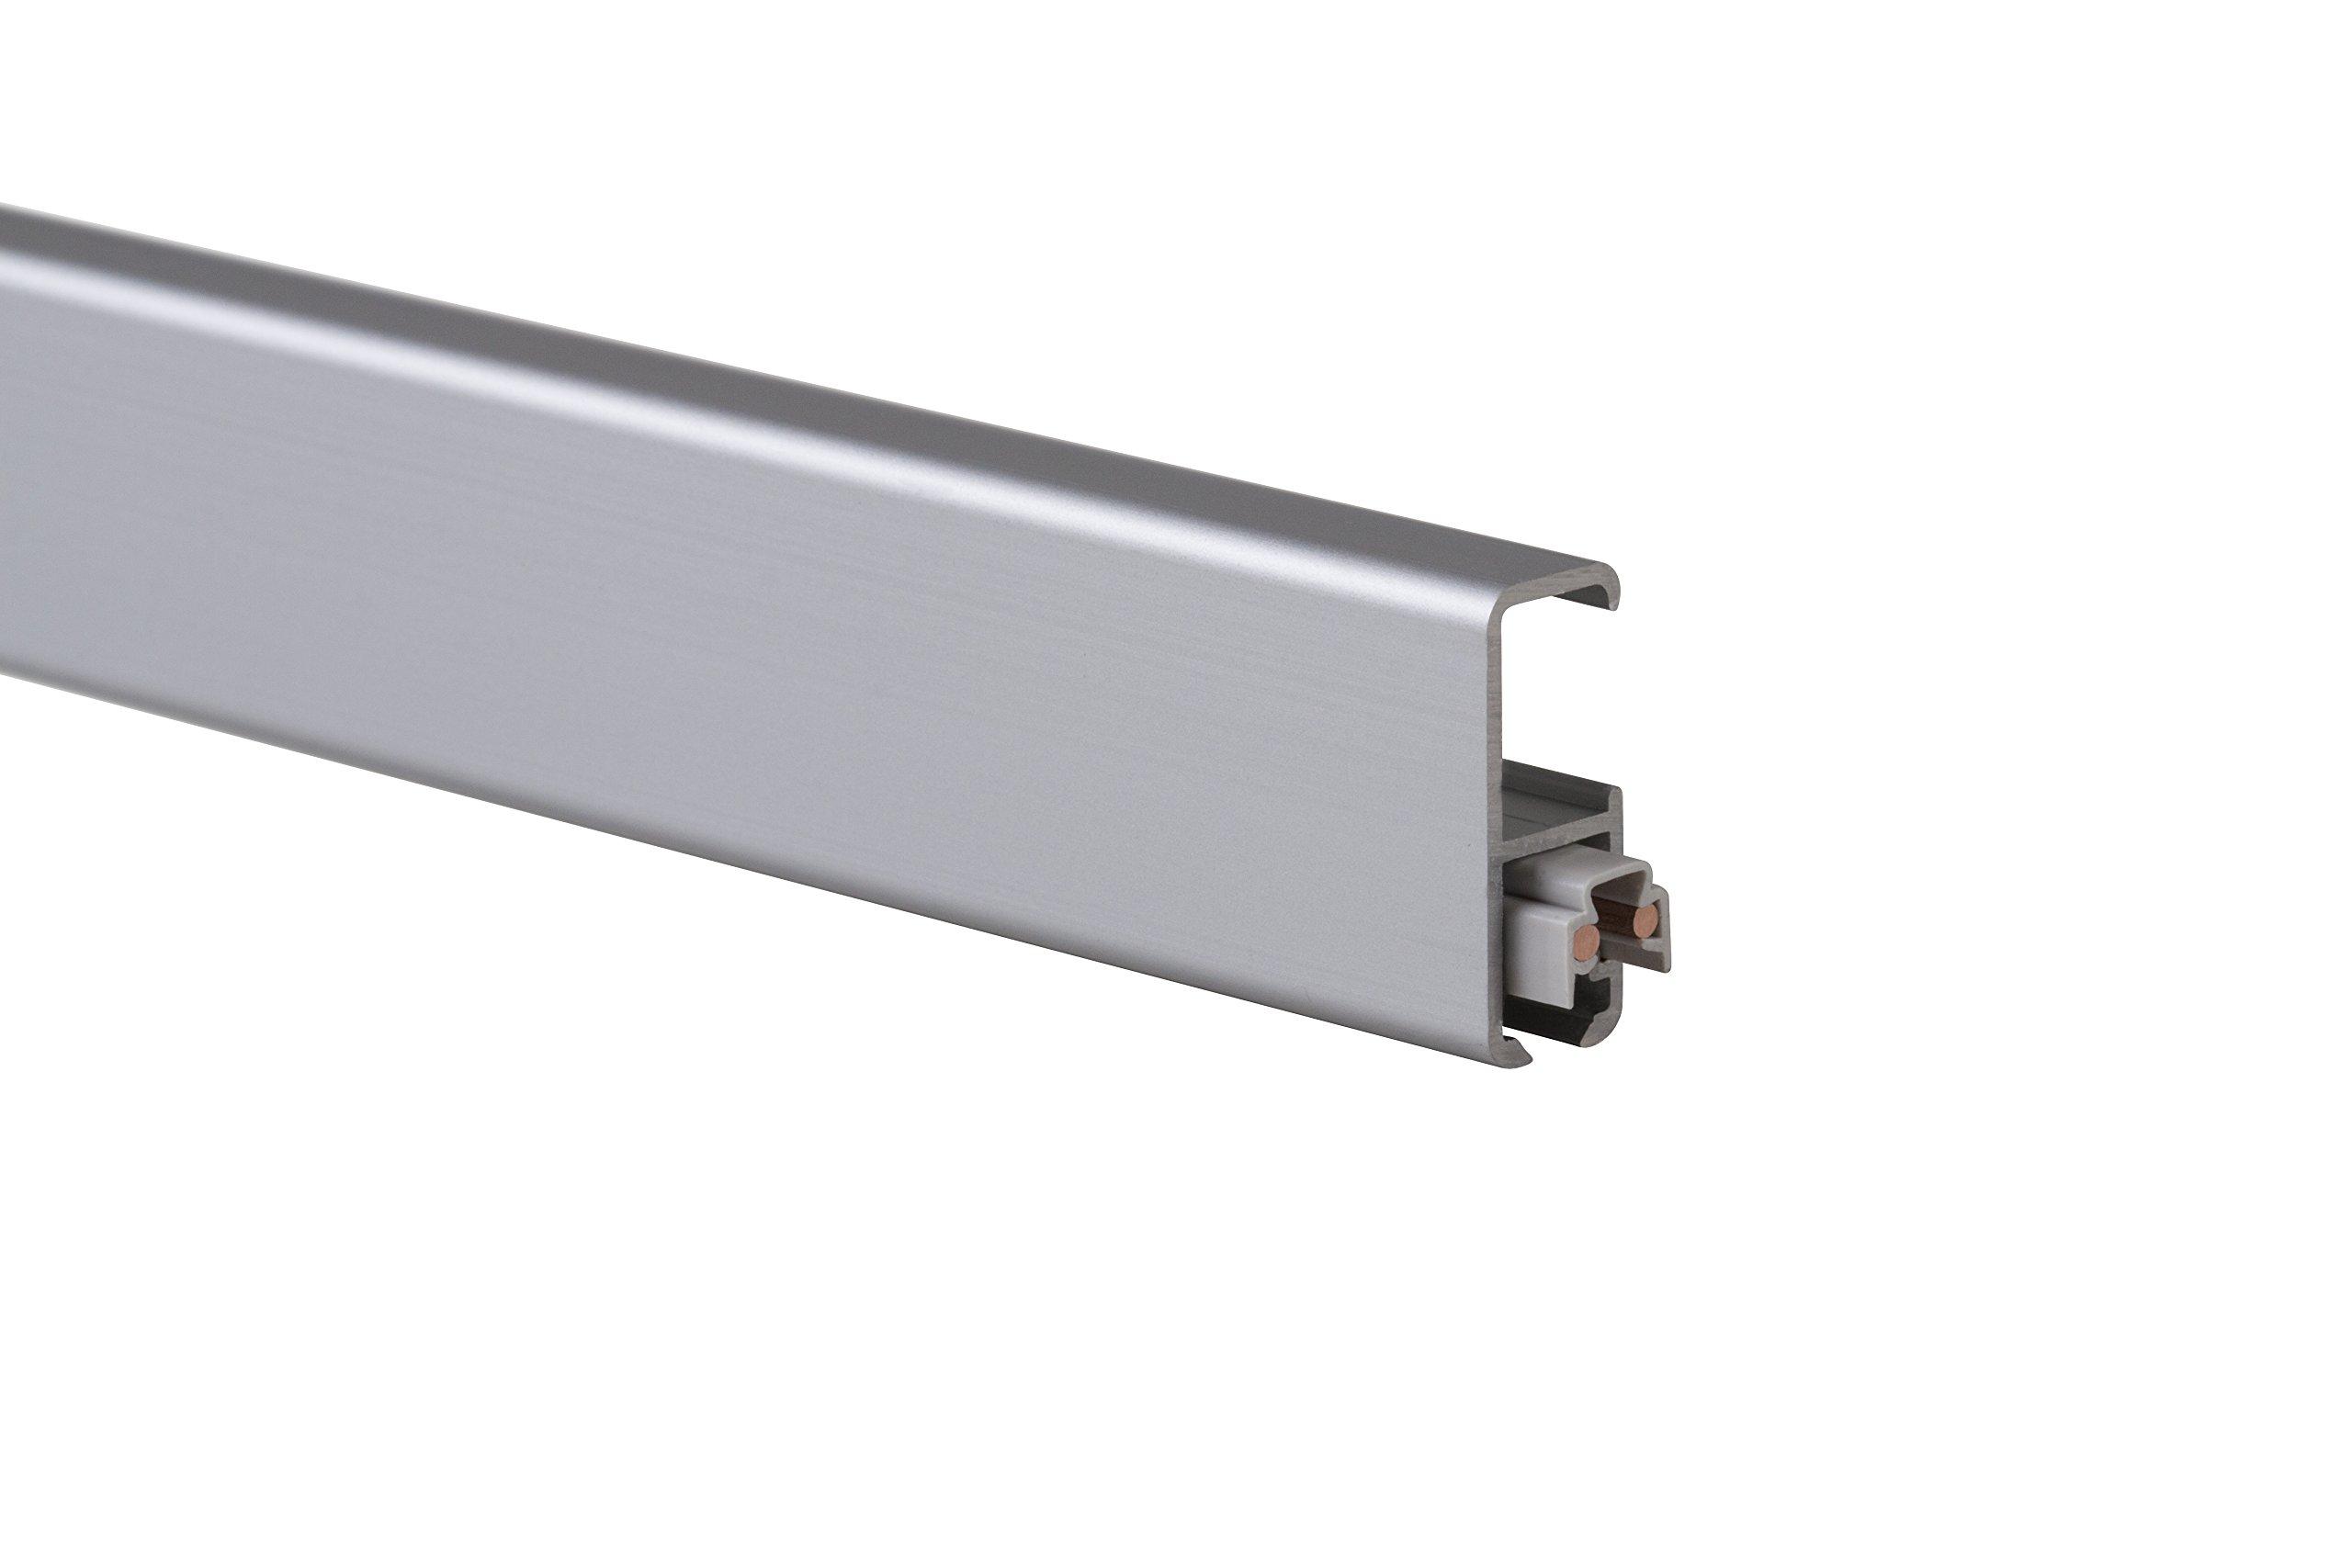 STAS multirail aluminum 200 cm + installation kit